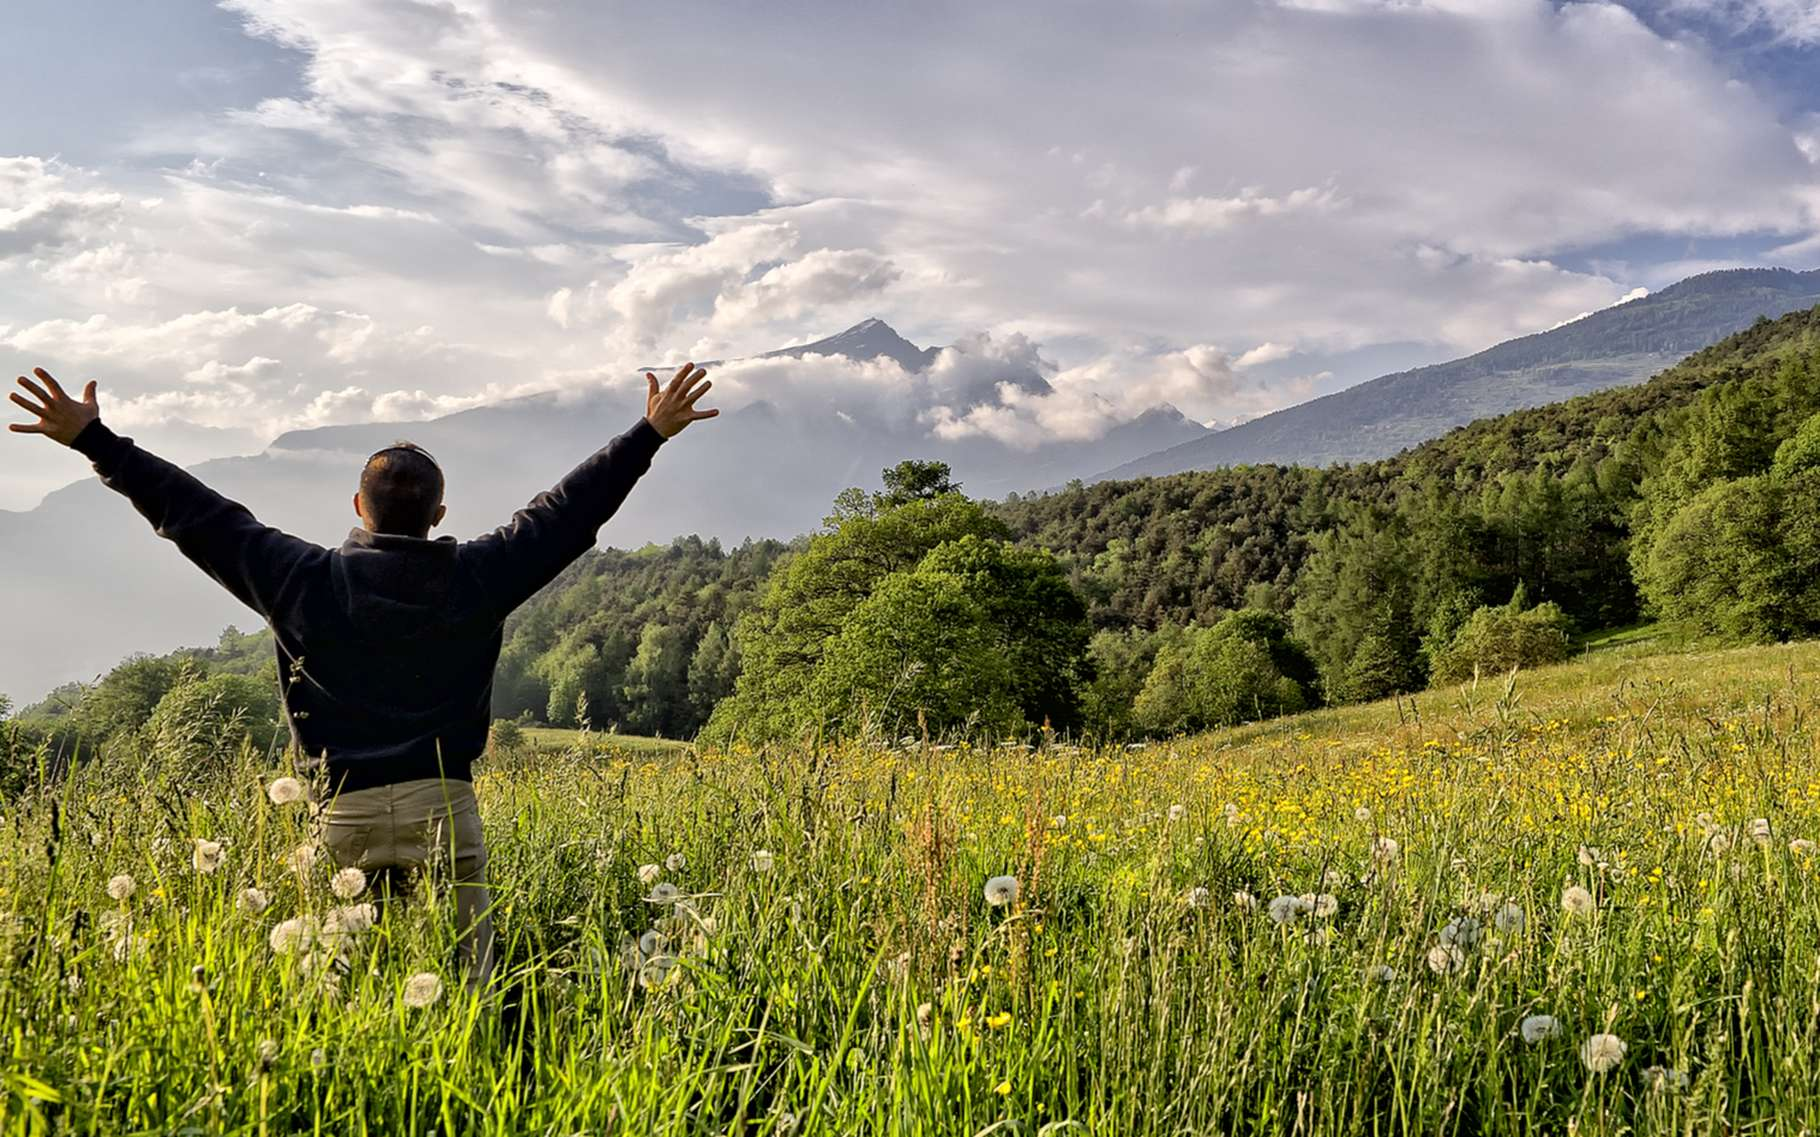 Des hommes qui ont eu de l'ocytocine en spray nasal ont connu un élan de spiritualité. © nivech, Shutterstock